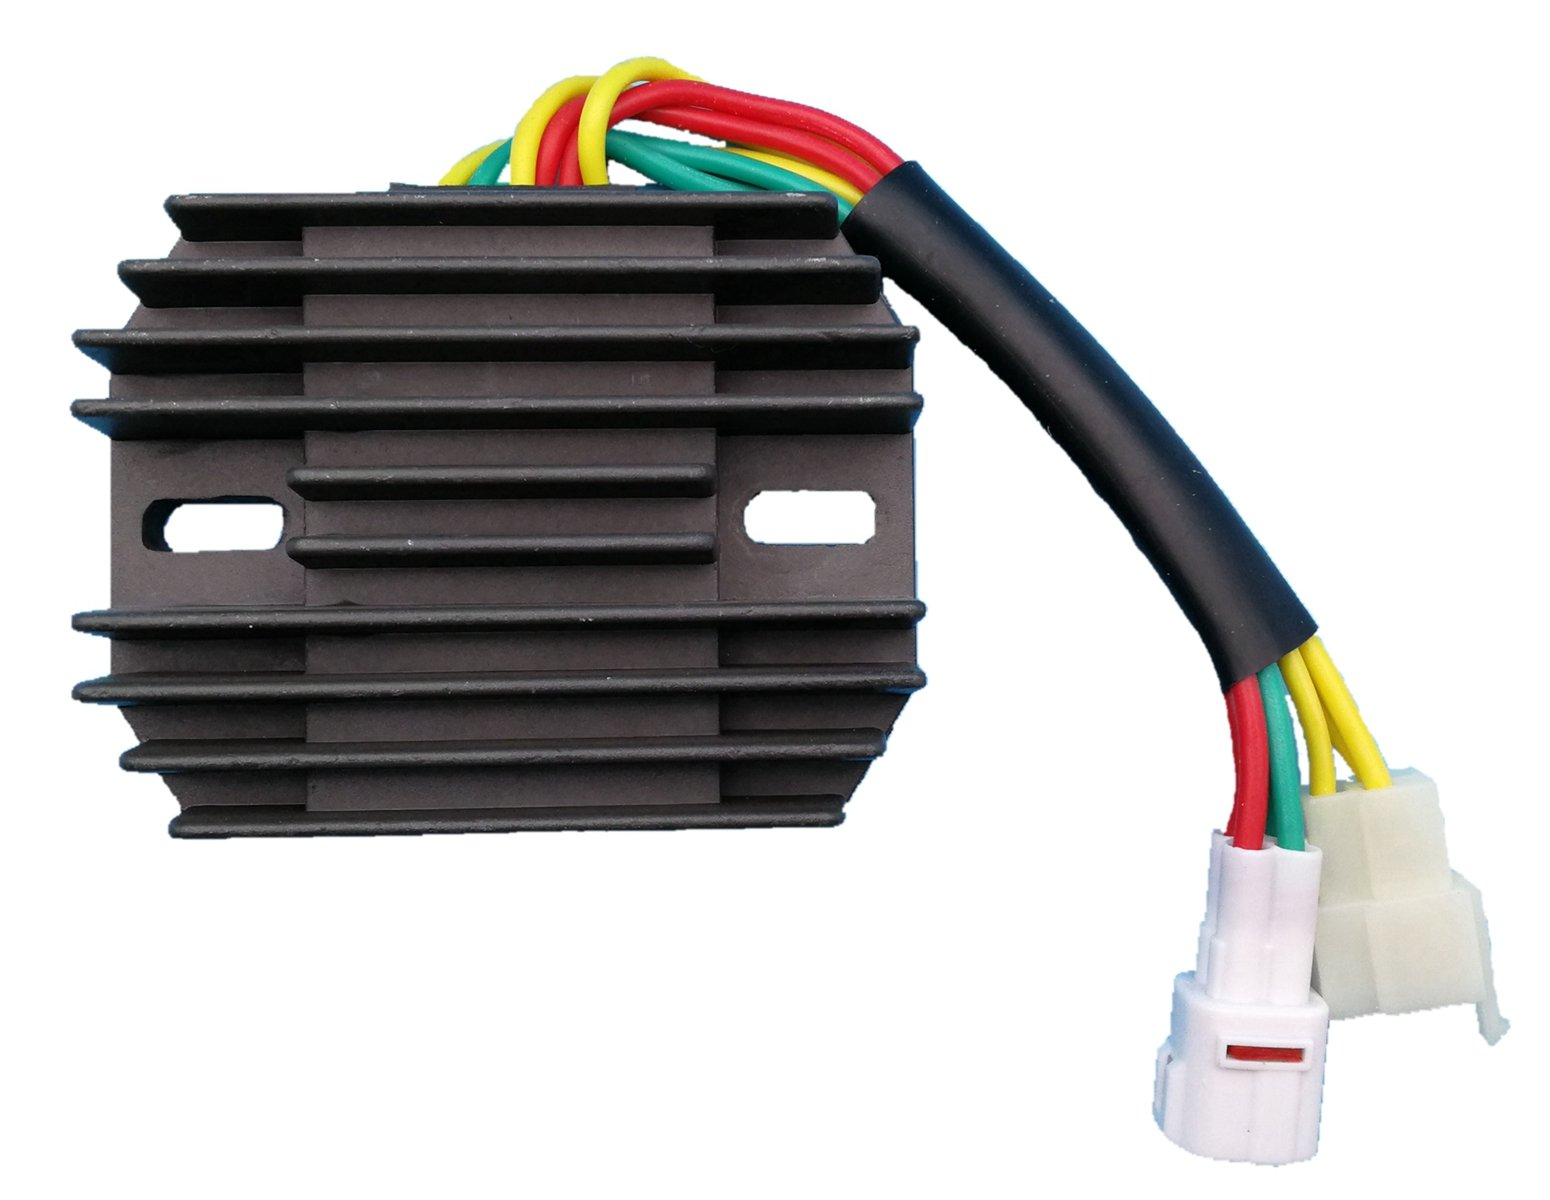 Cheap V Star 650 Manual Find Deals On Line At Classic Wiring Diagram Get Quotations Generic Voltage Regulator For Suzuki Gsx650 Gsx650f Sv1000 Sv650 Gsxr600 Gsxr750 Gsxr1000 Sfv650 Gsf1250 Dl650 Vl1500